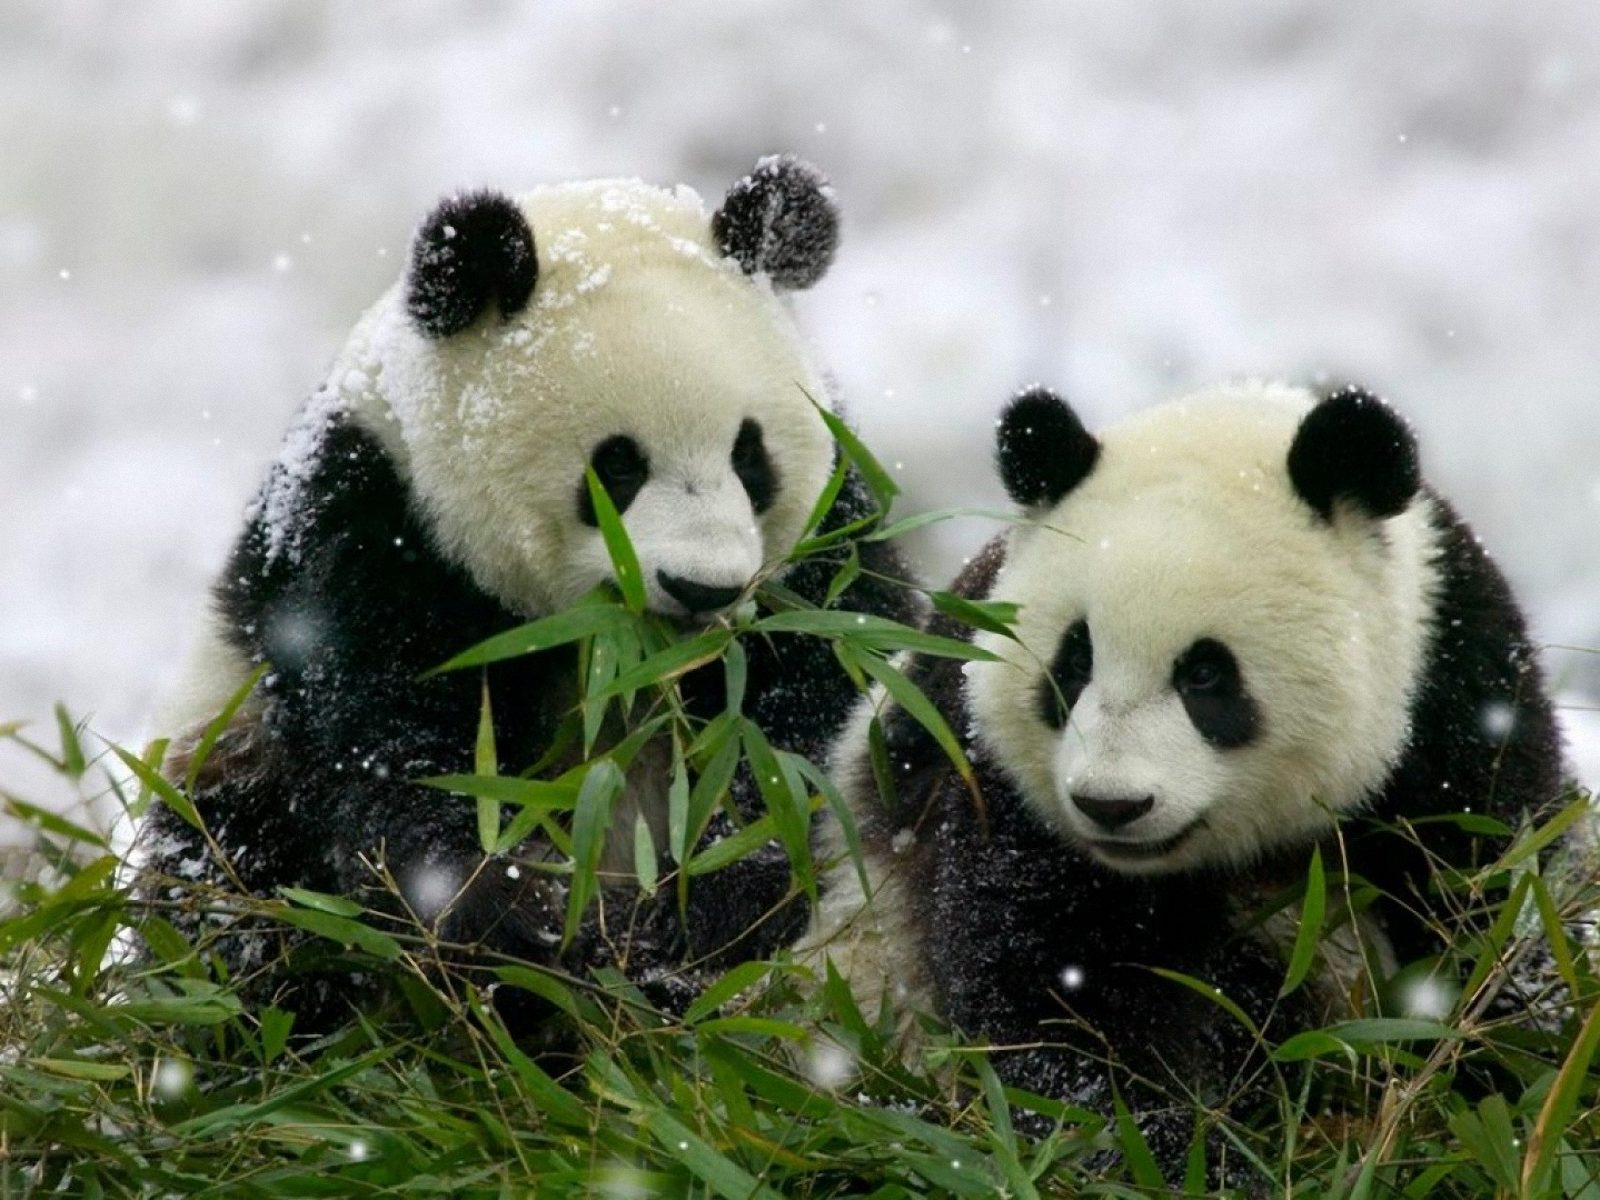 Bamboo Wallpaper Bamboo Wallpapers 10 20 Panda In Bamboo